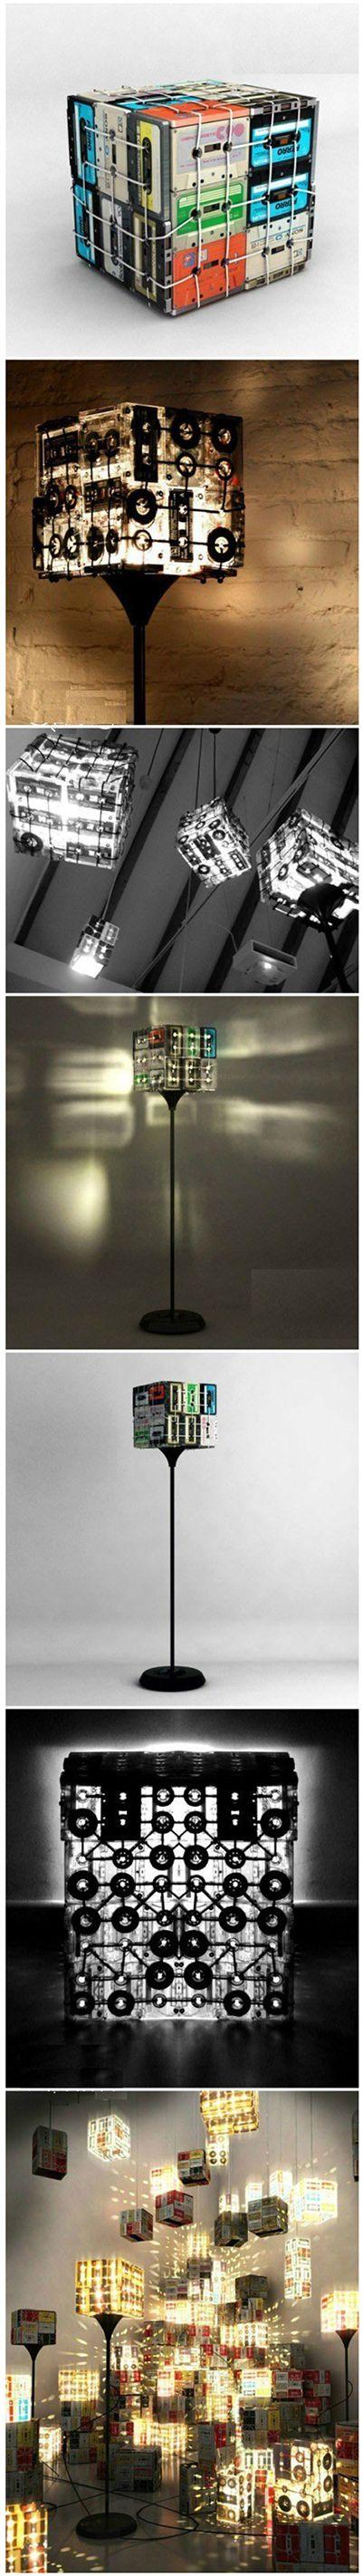 Diy Cool Tapes Lamp | DIY & Crafts Tutorials